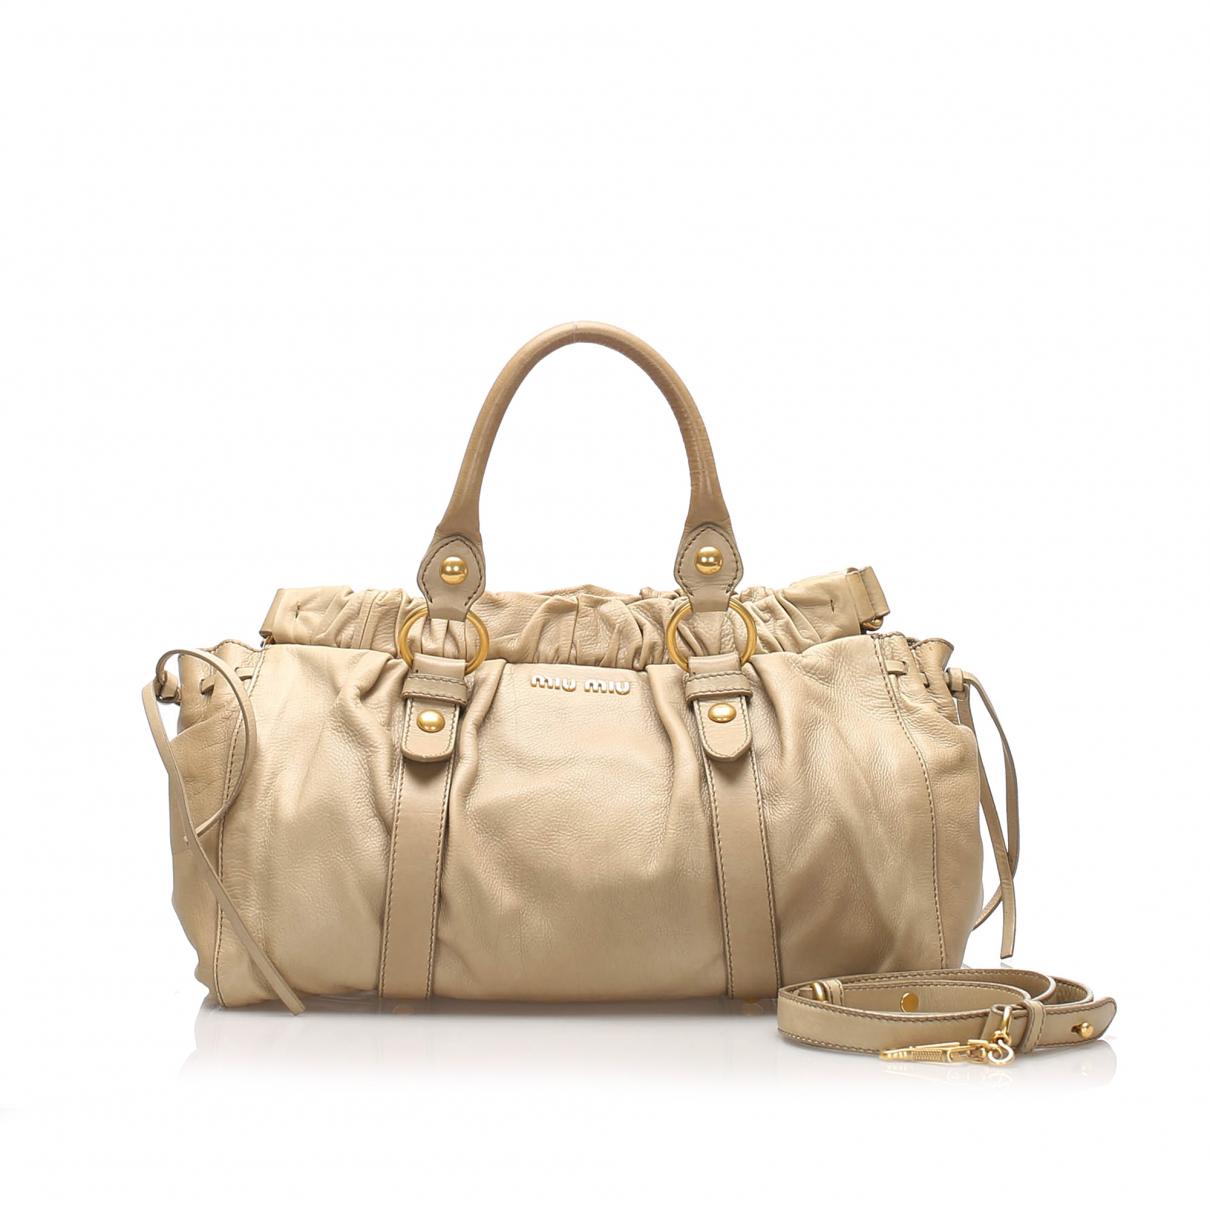 Miu Miu Bow bag Brown Leather handbag for Women N